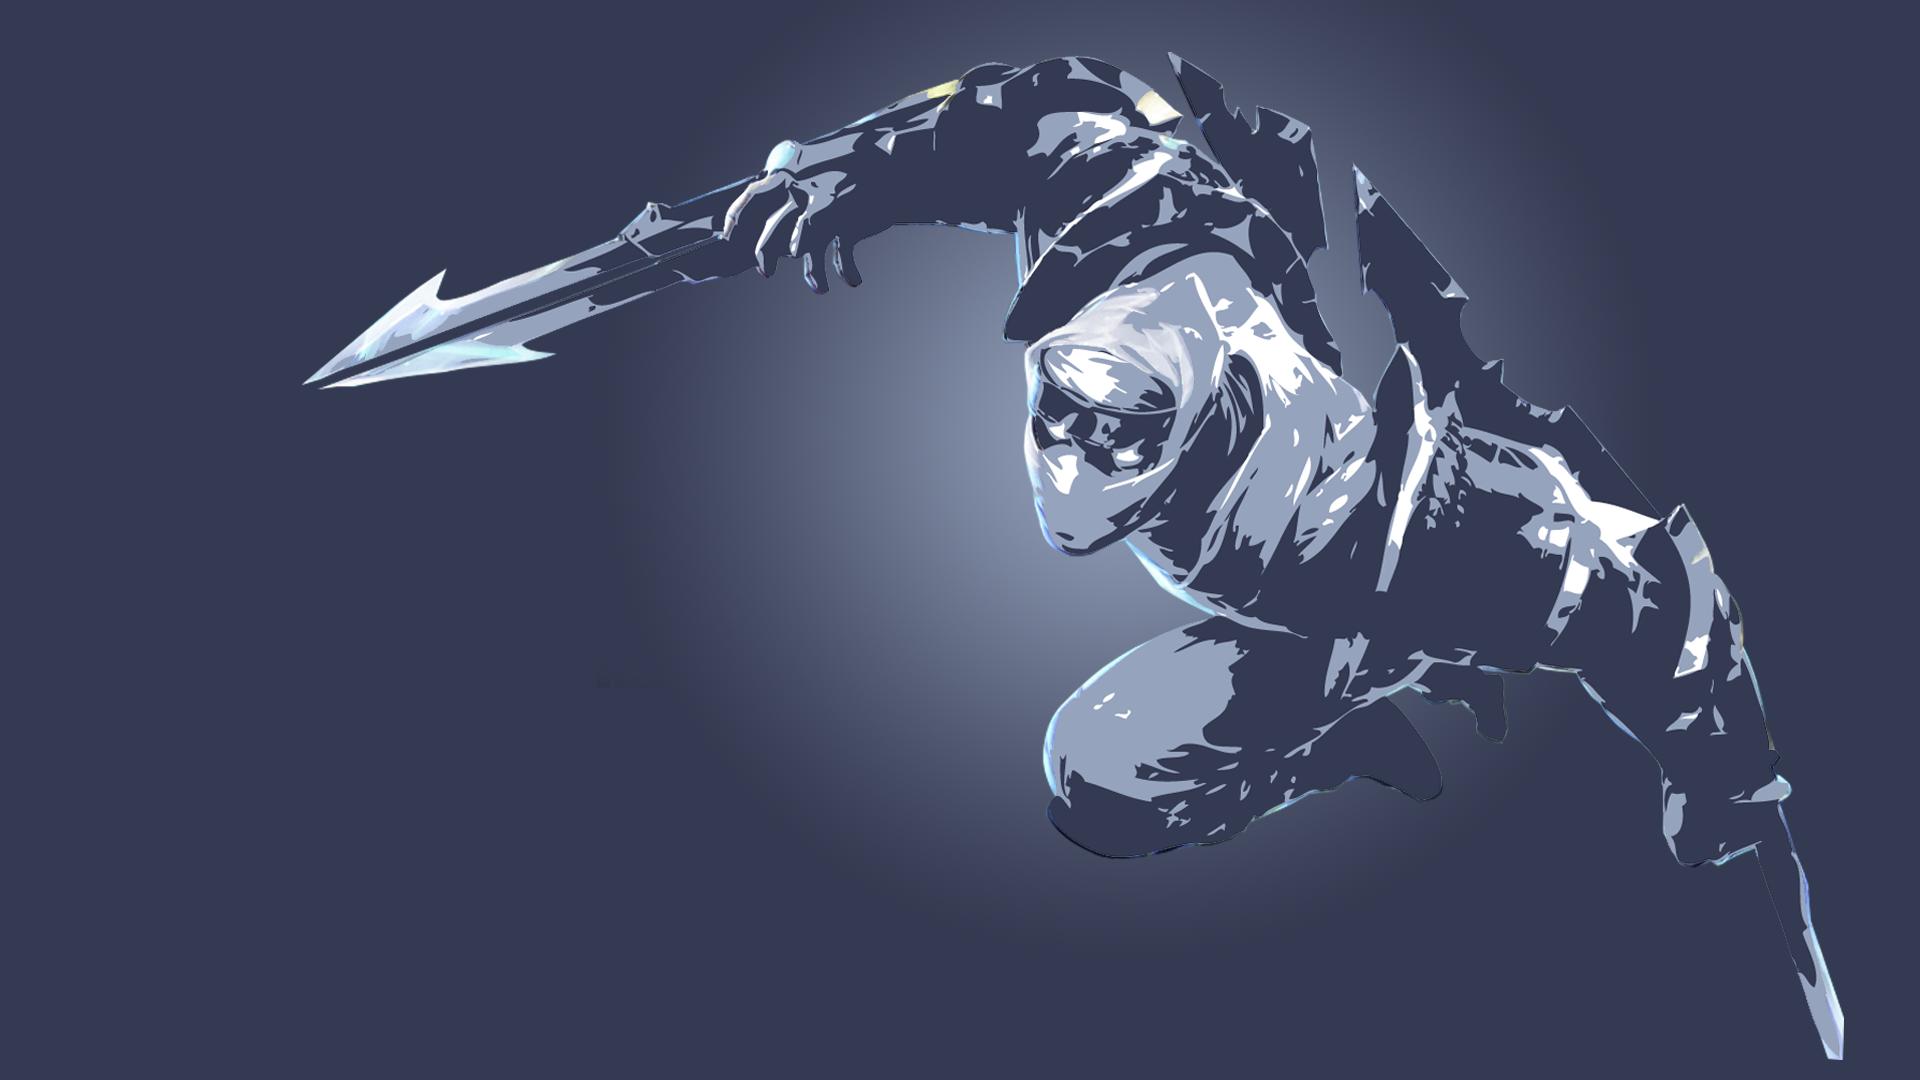 Shockblade Zed Minimalistic wallpaper